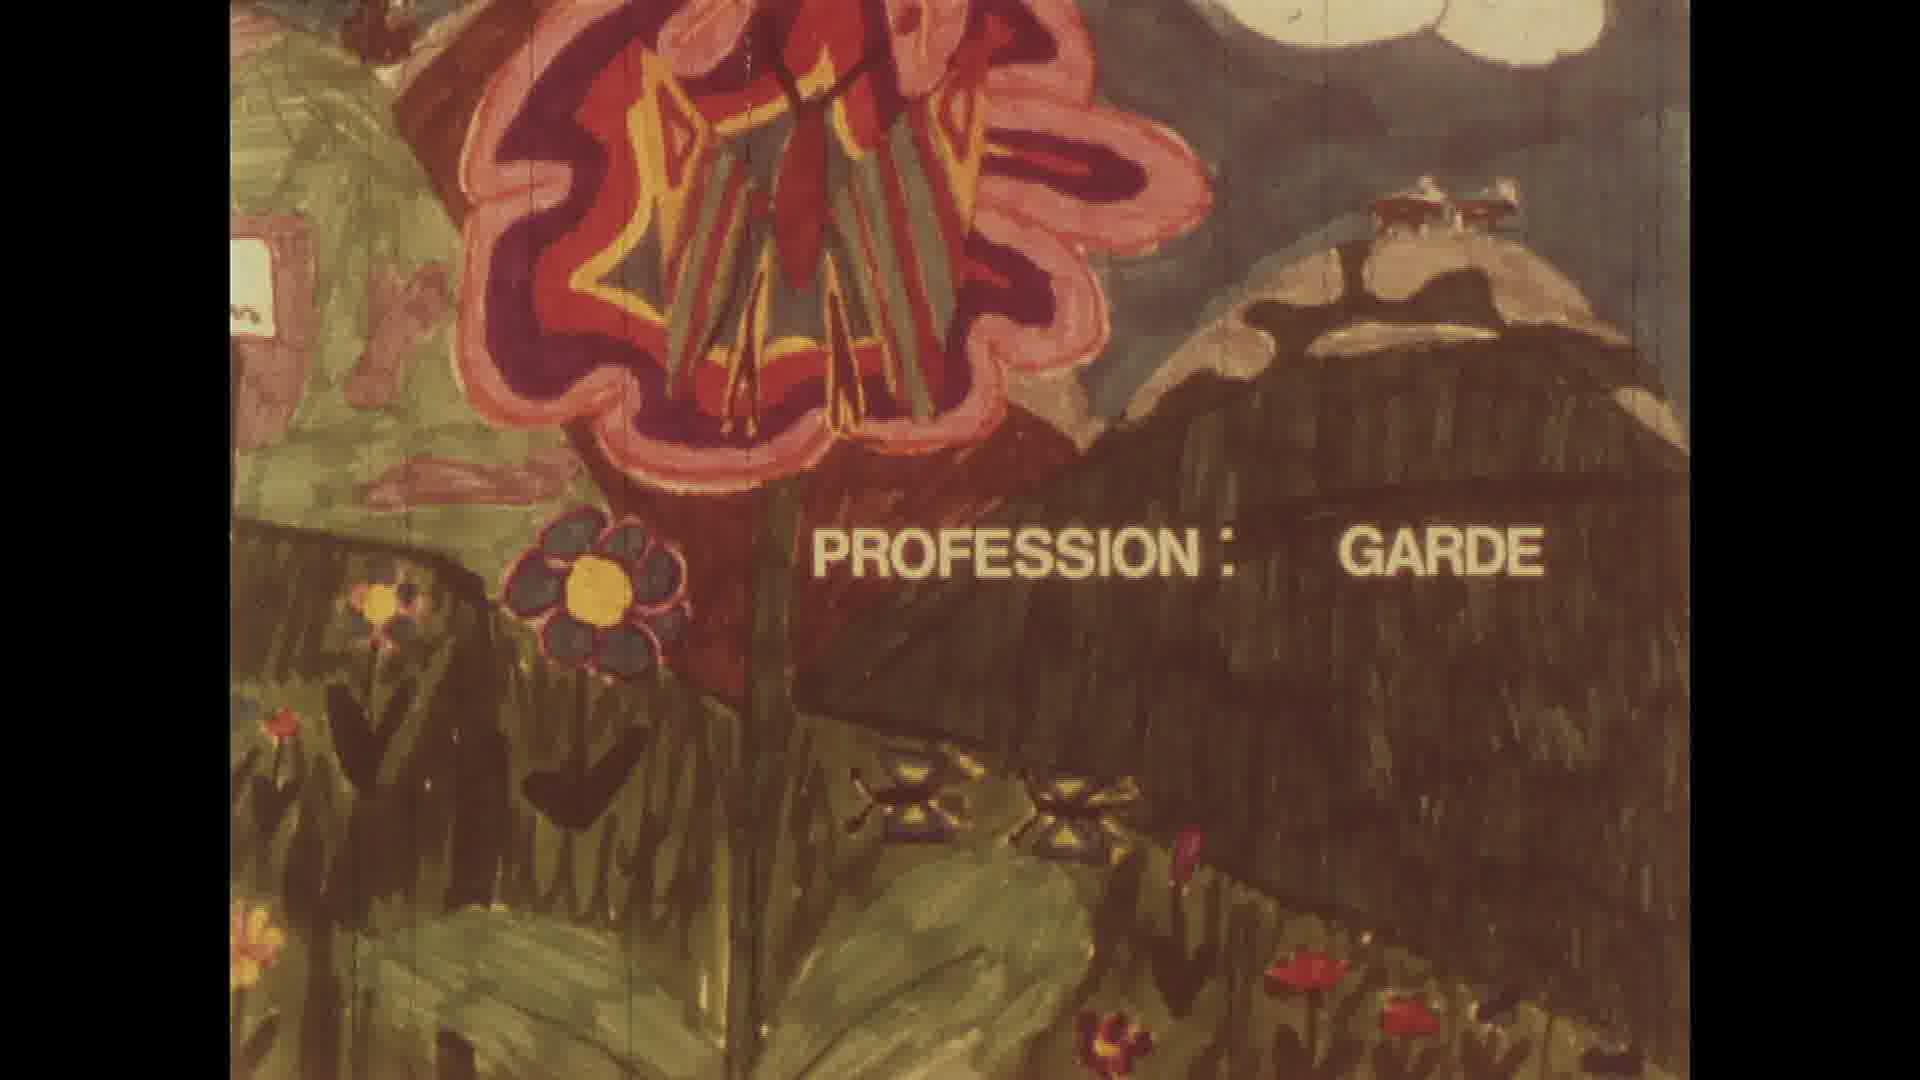 Profession : garde